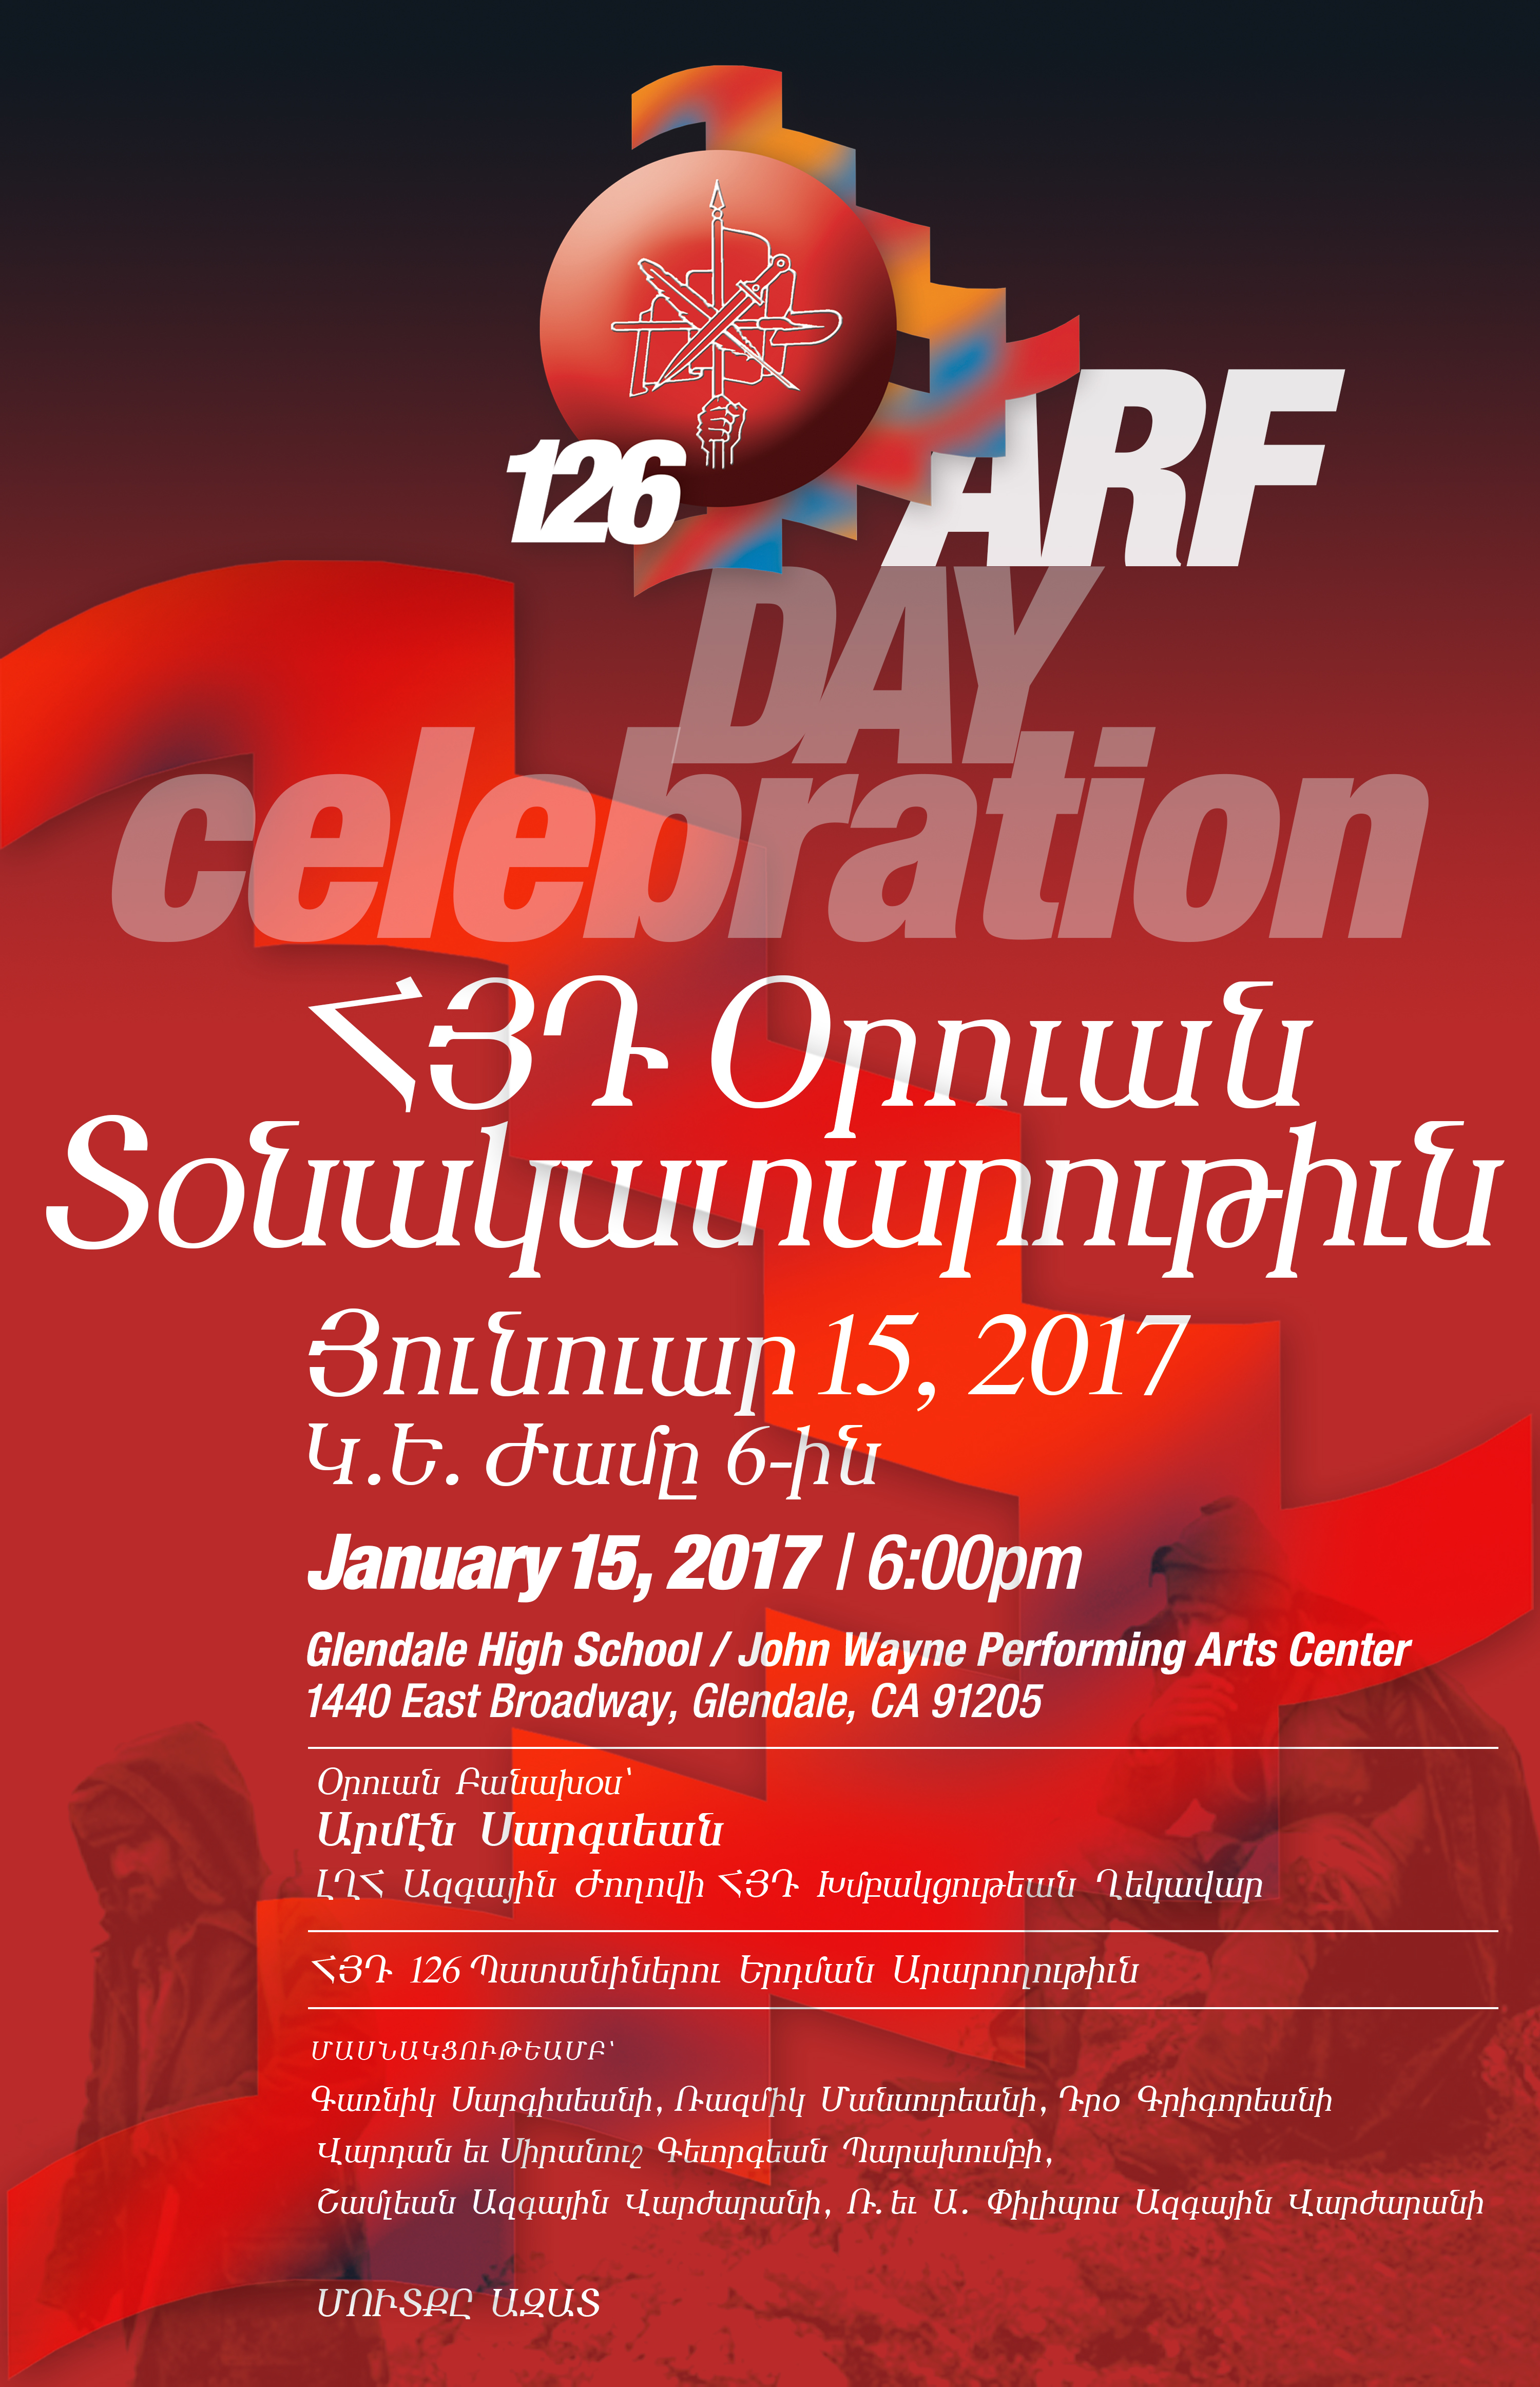 ARF_Day_2017_flyer.jpg